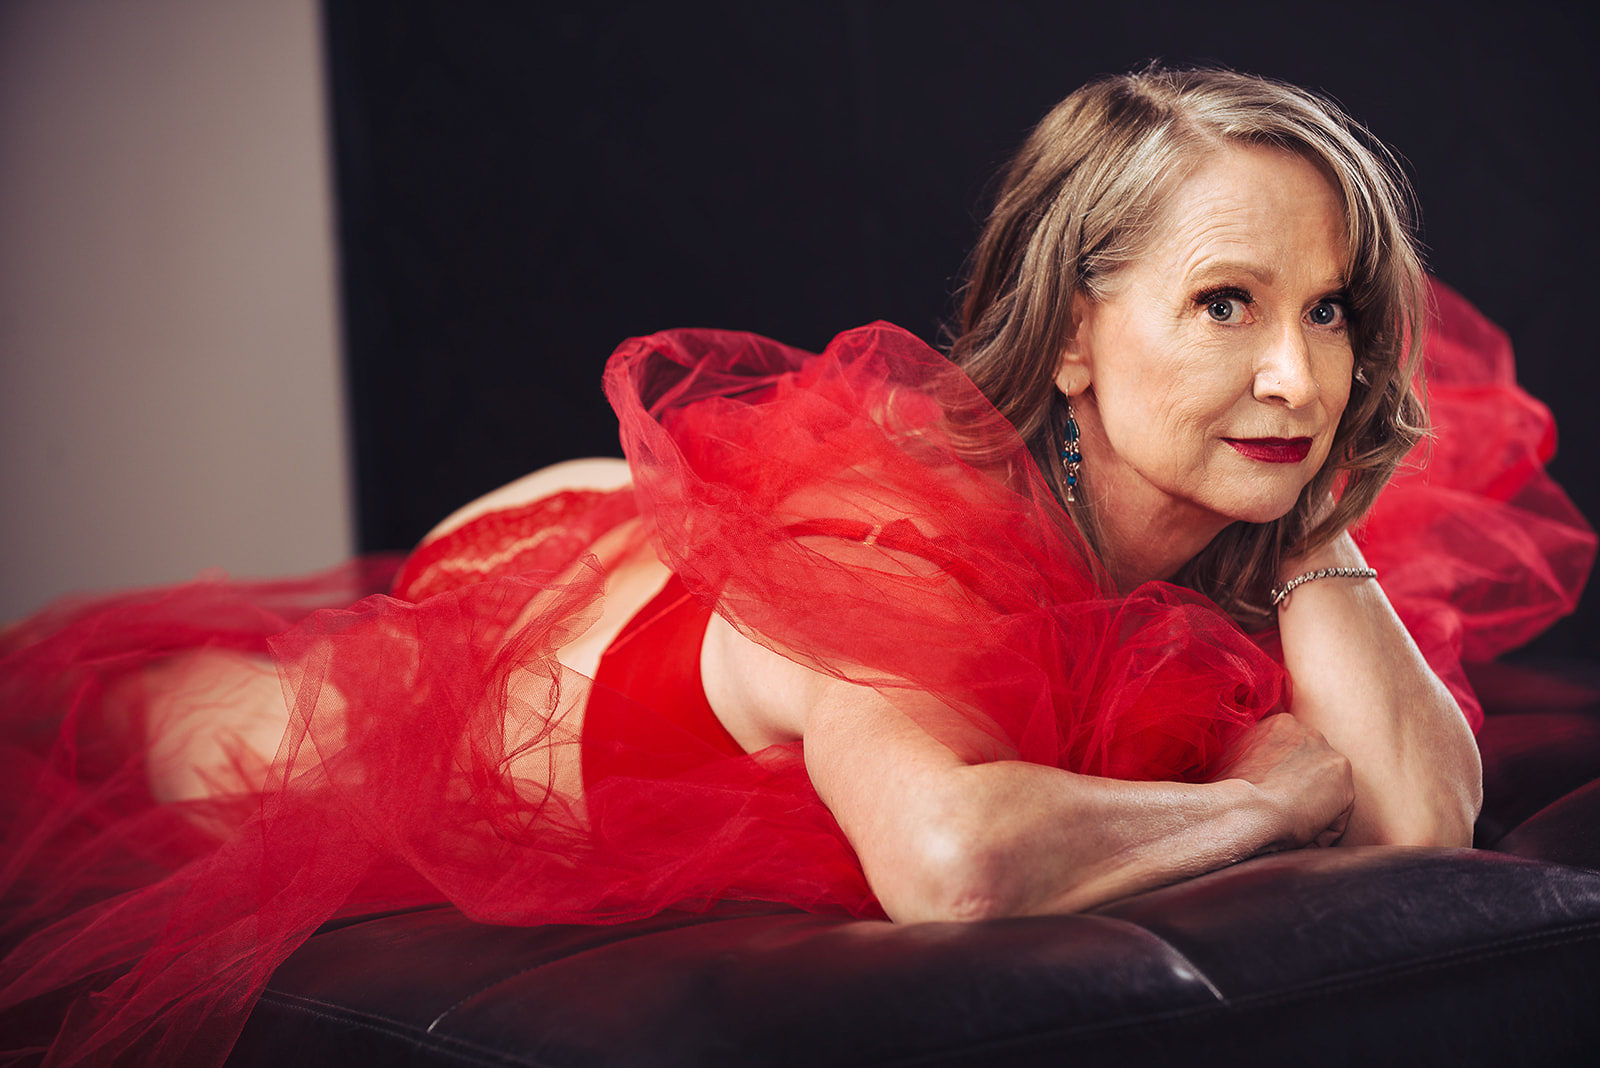 Smudge-Smoulder-Makeup-Artist-Calgary-YYC-Banff-Canmore-Beauty-Weddings-bridal-boudoir